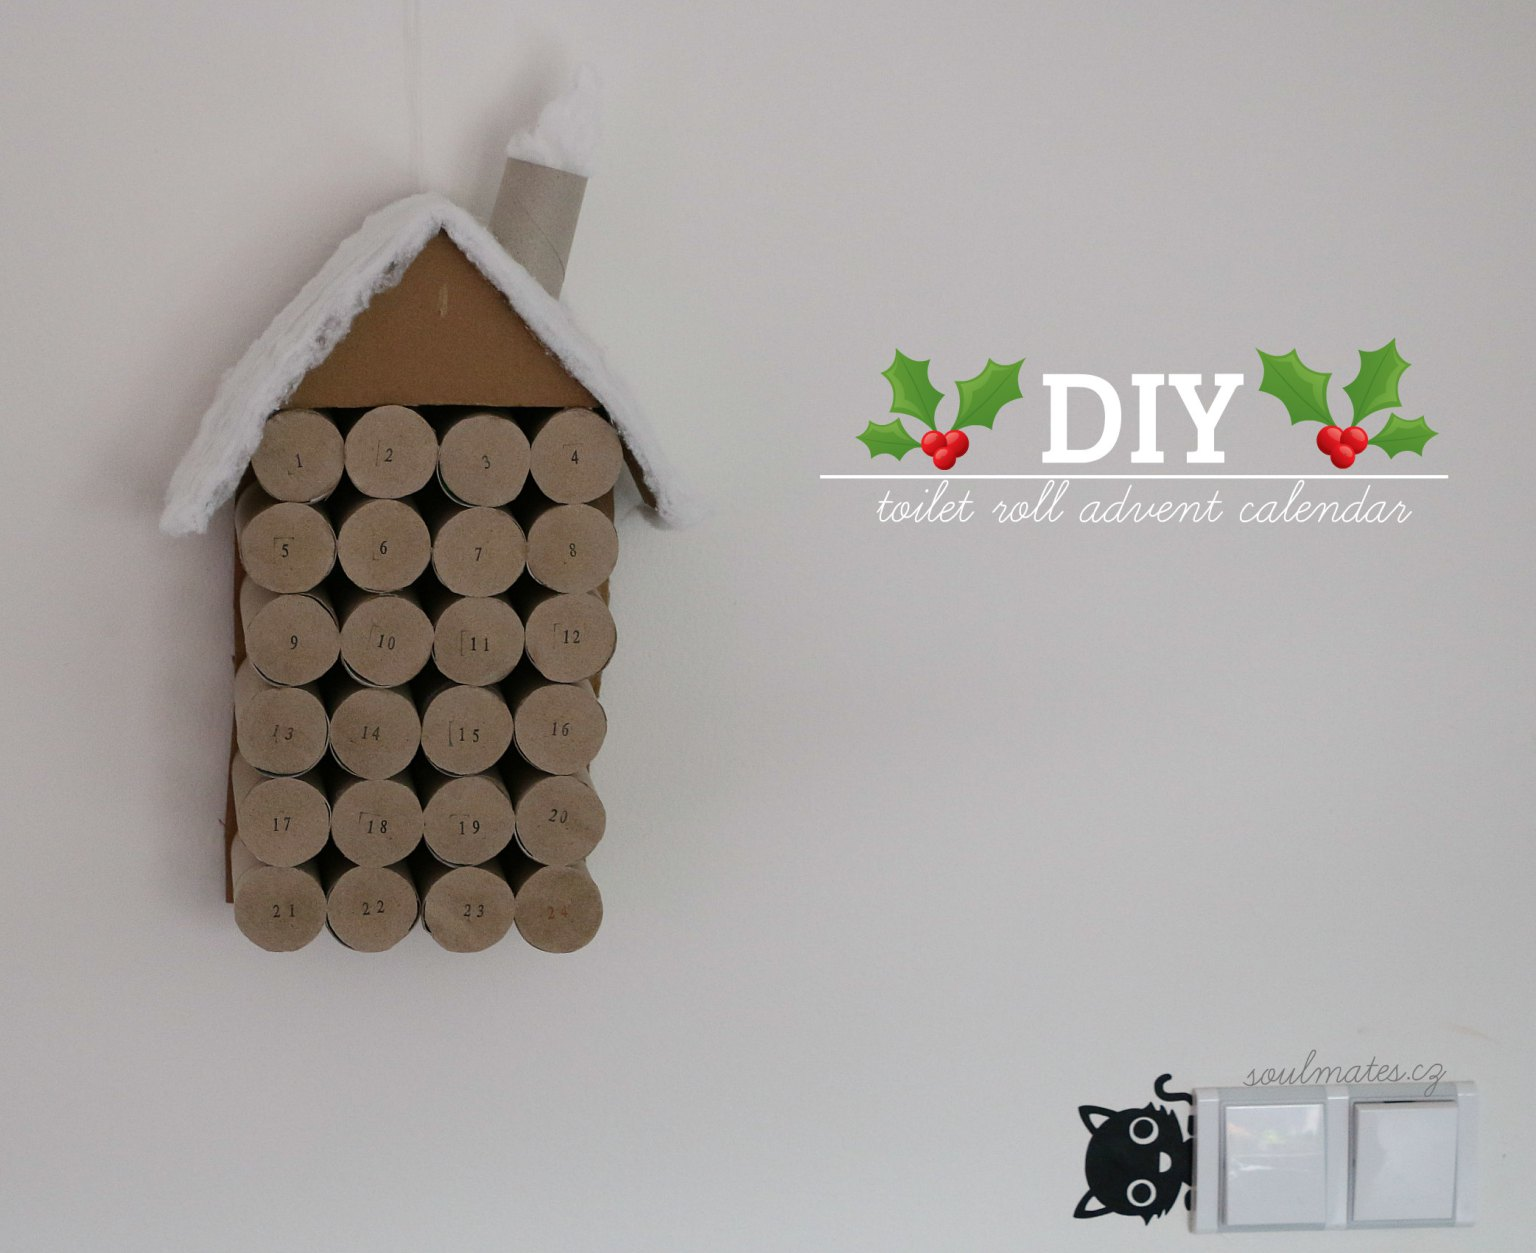 adventni kalendar diy DIY: Adventní kalendář | Nicole adventni kalendar diy